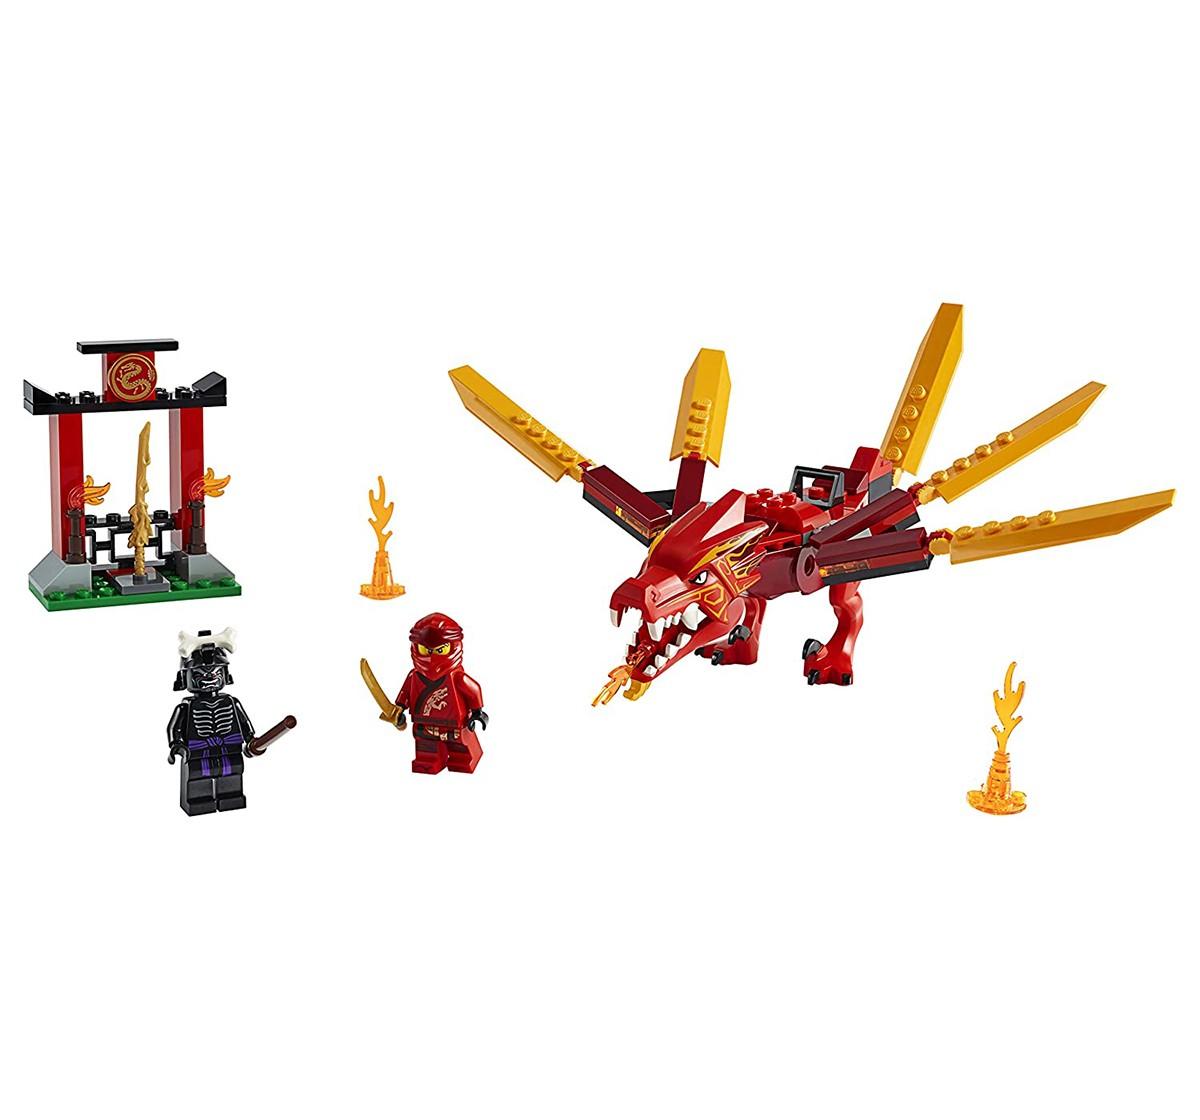 Lego Ninjago 71701 Kai'S Fire Dragon Blocks for Kids age 4Y+